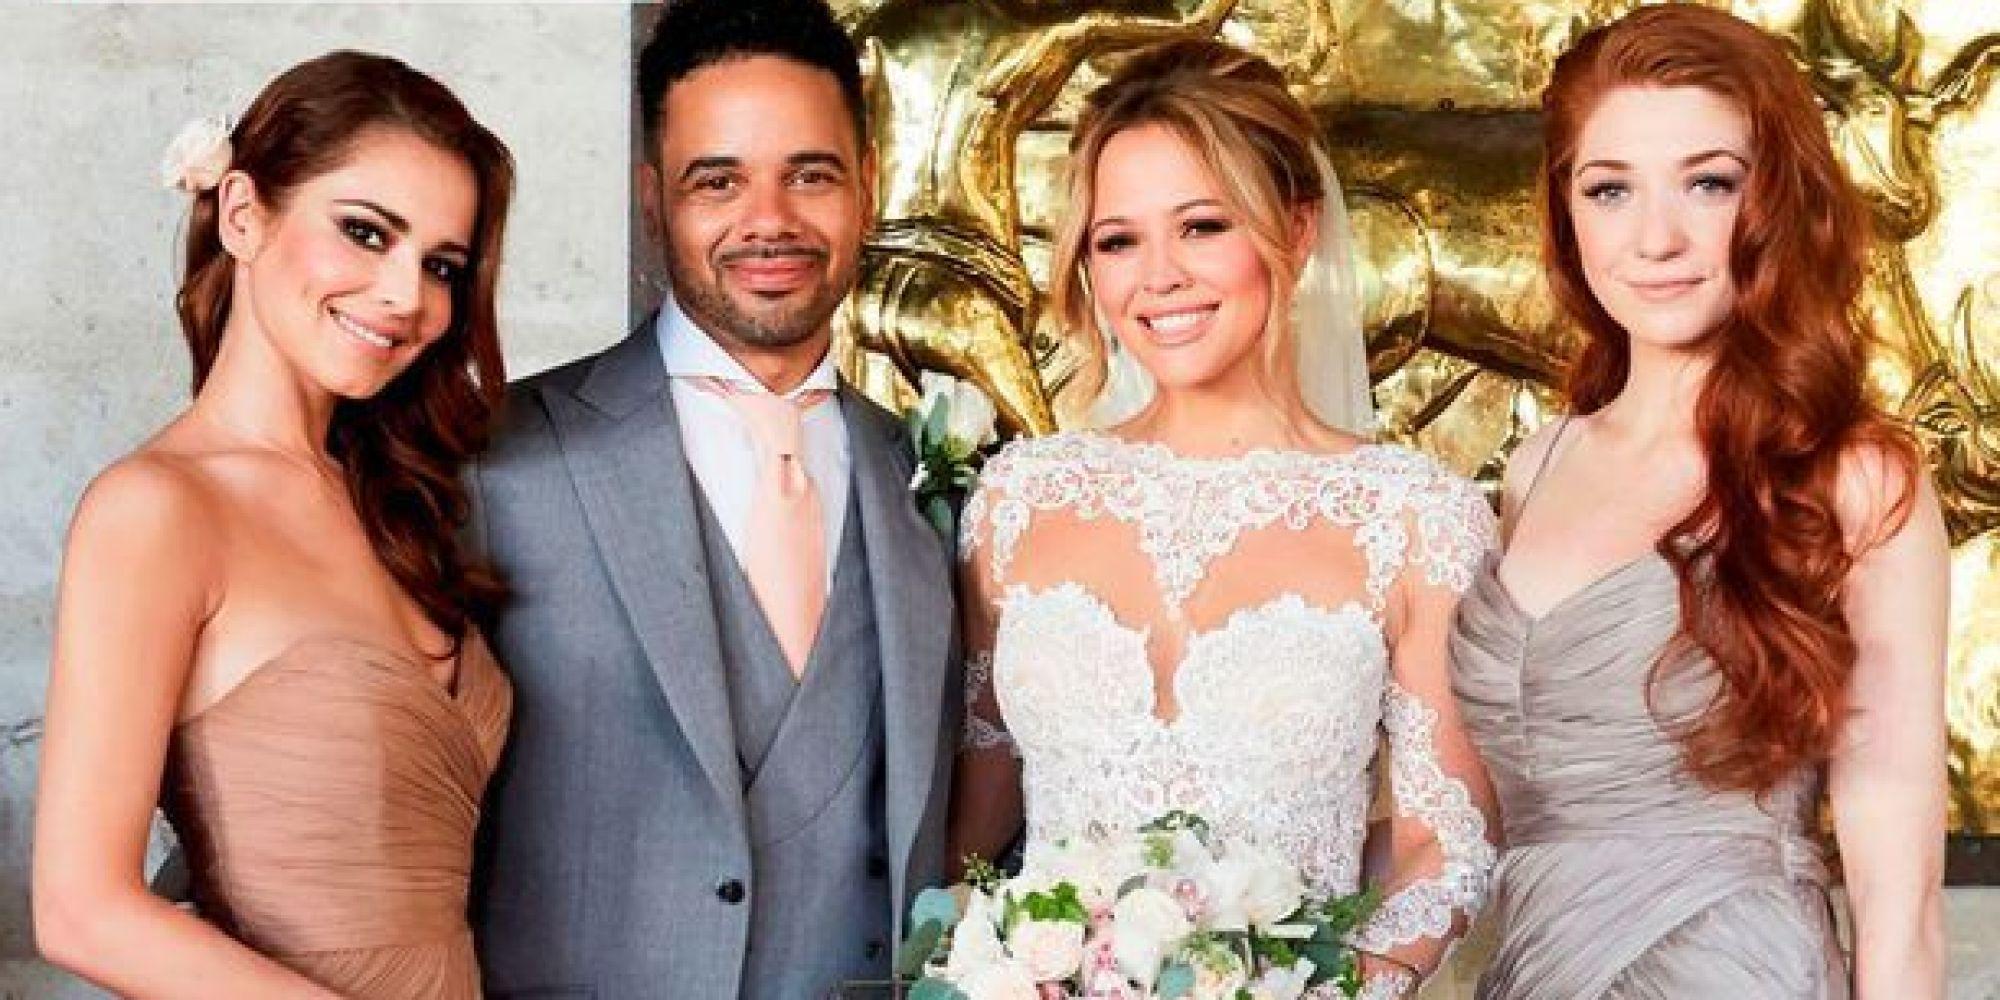 kimberley walsh wedding dress and designer revealed see